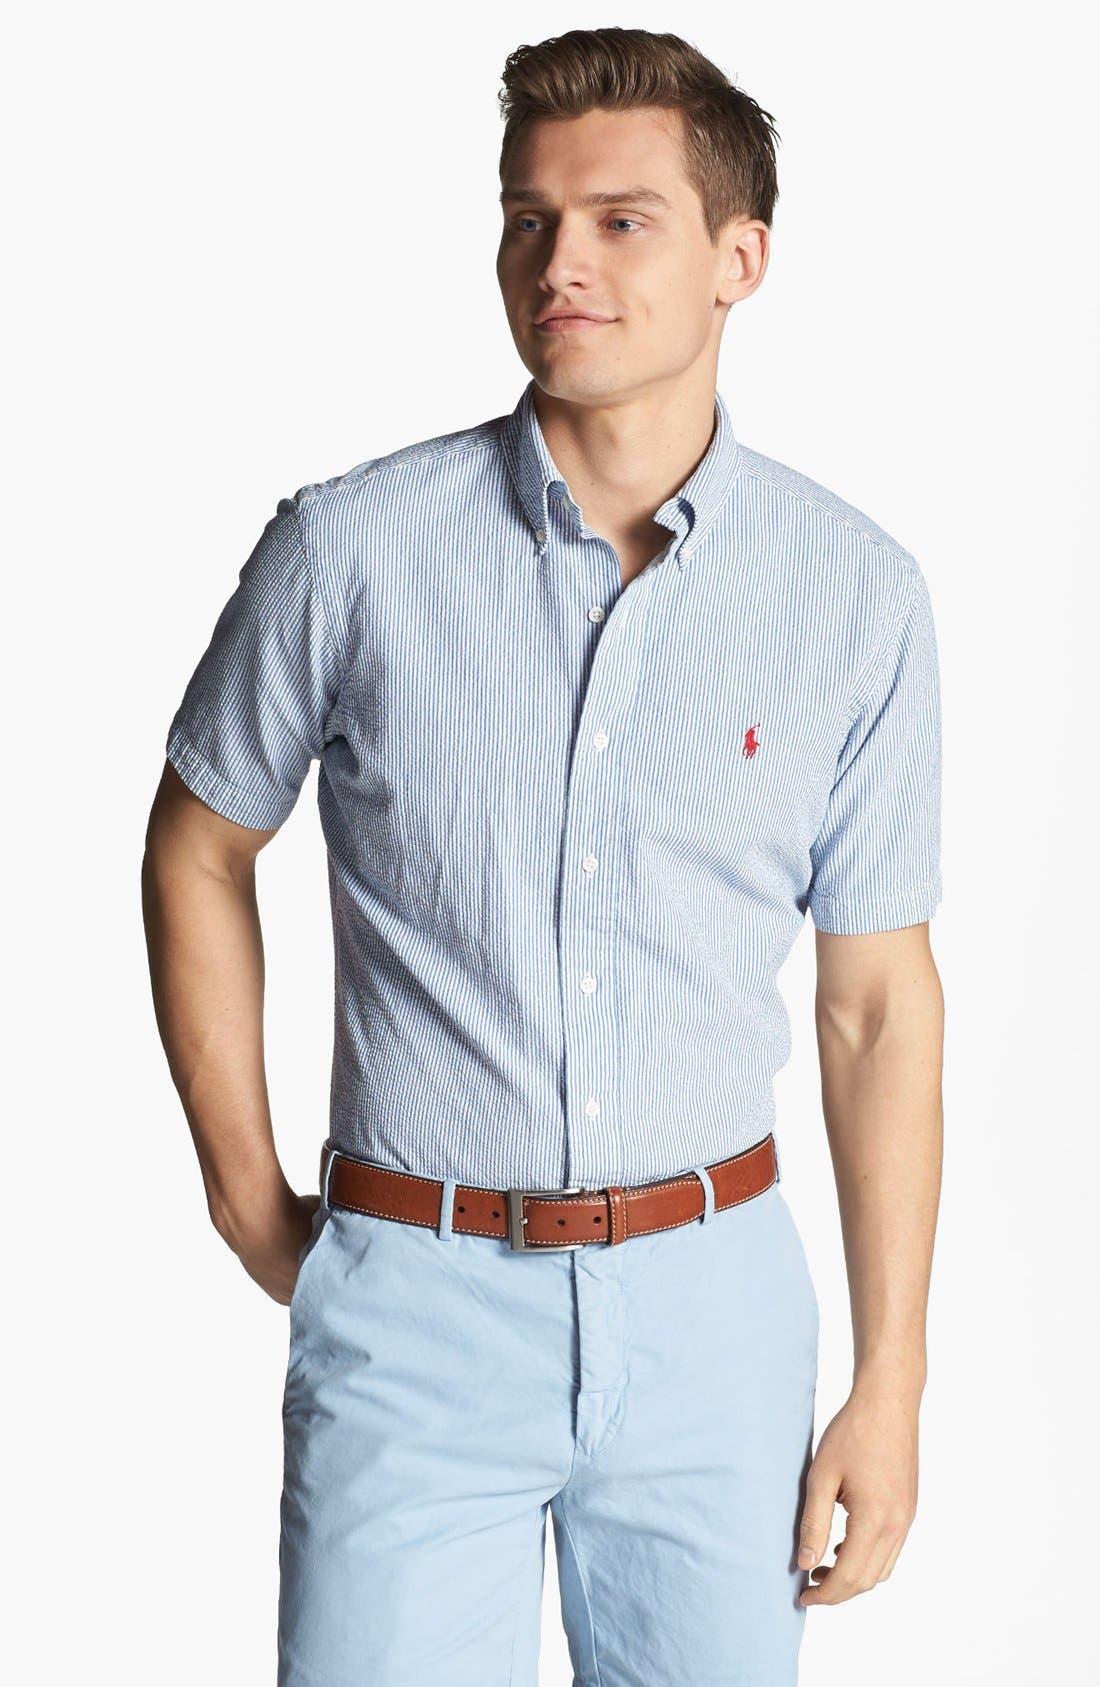 Alternate Image 1 Selected - Polo Ralph Lauren Short Sleeve Seersucker Sport Shirt